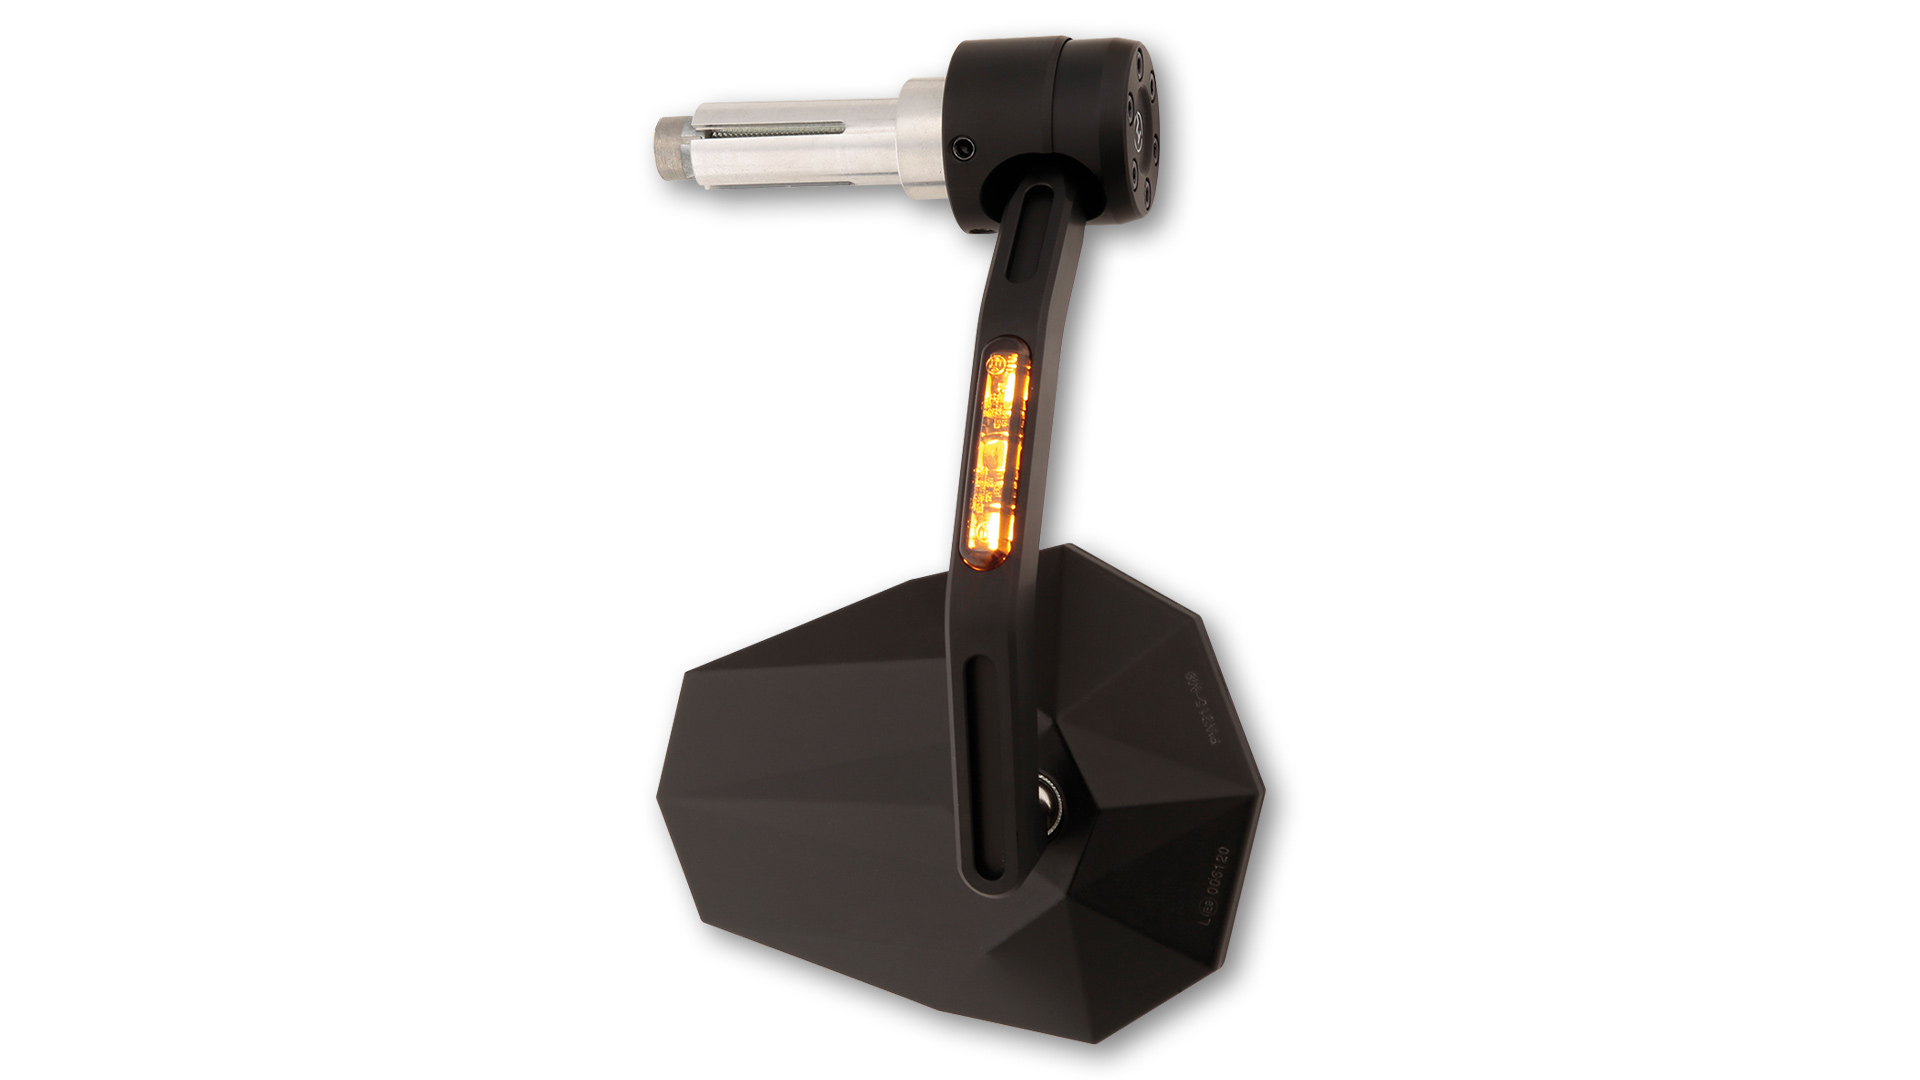 highsider Espejo final de manillar STEALTH-X7 con intermitentes LED